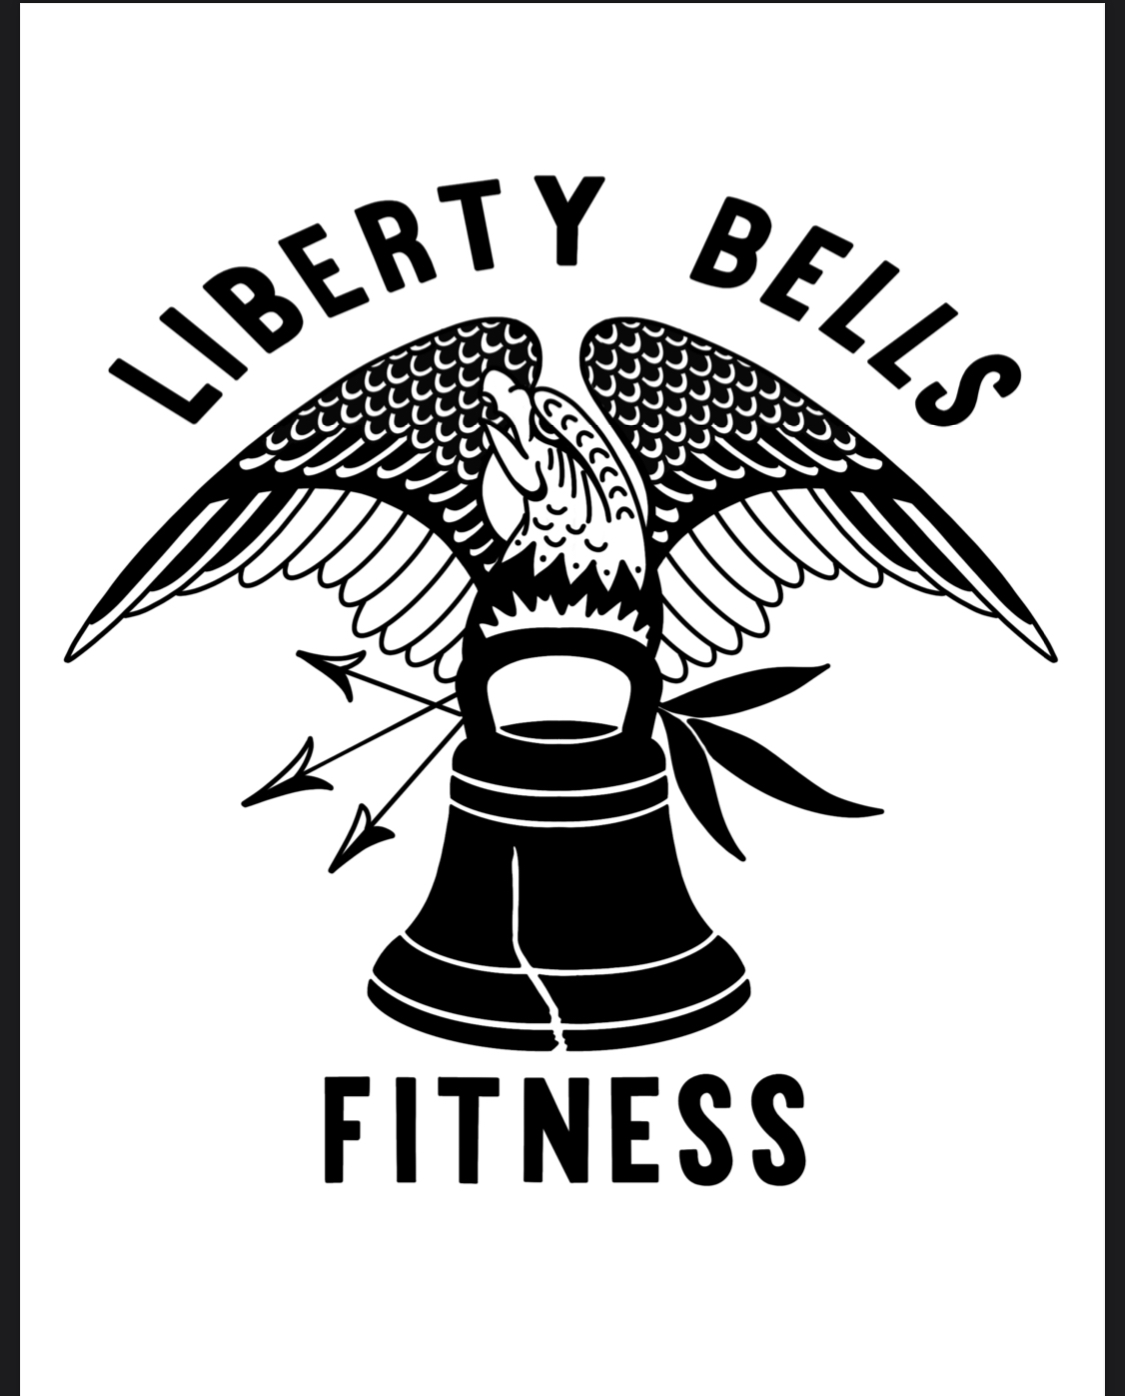 Liberty Bells Fitness LLC